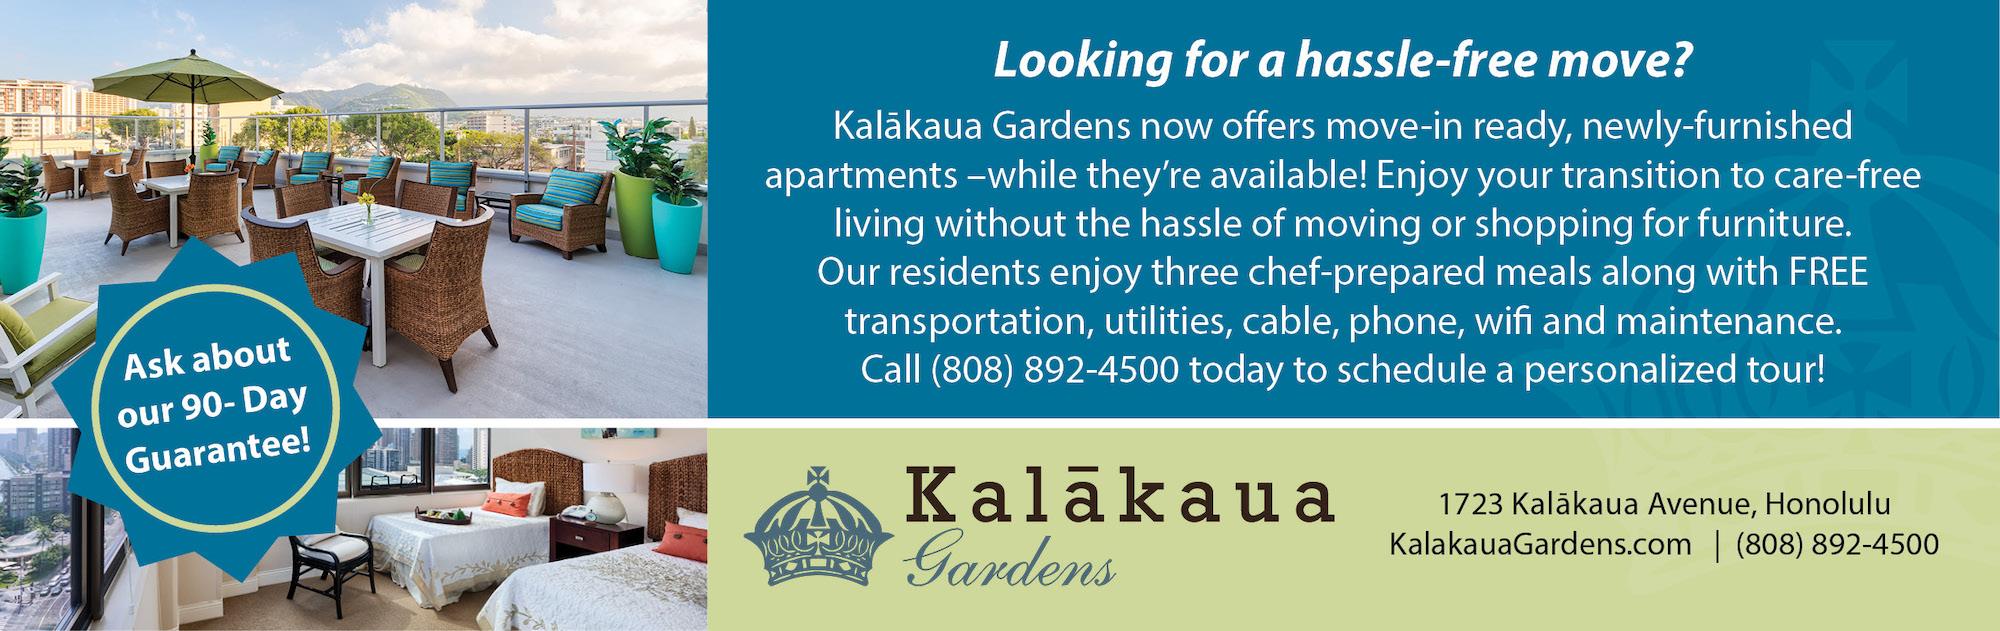 Kalākaua Gardens Hassle Free Move Furnished Rooms Senior Living Available